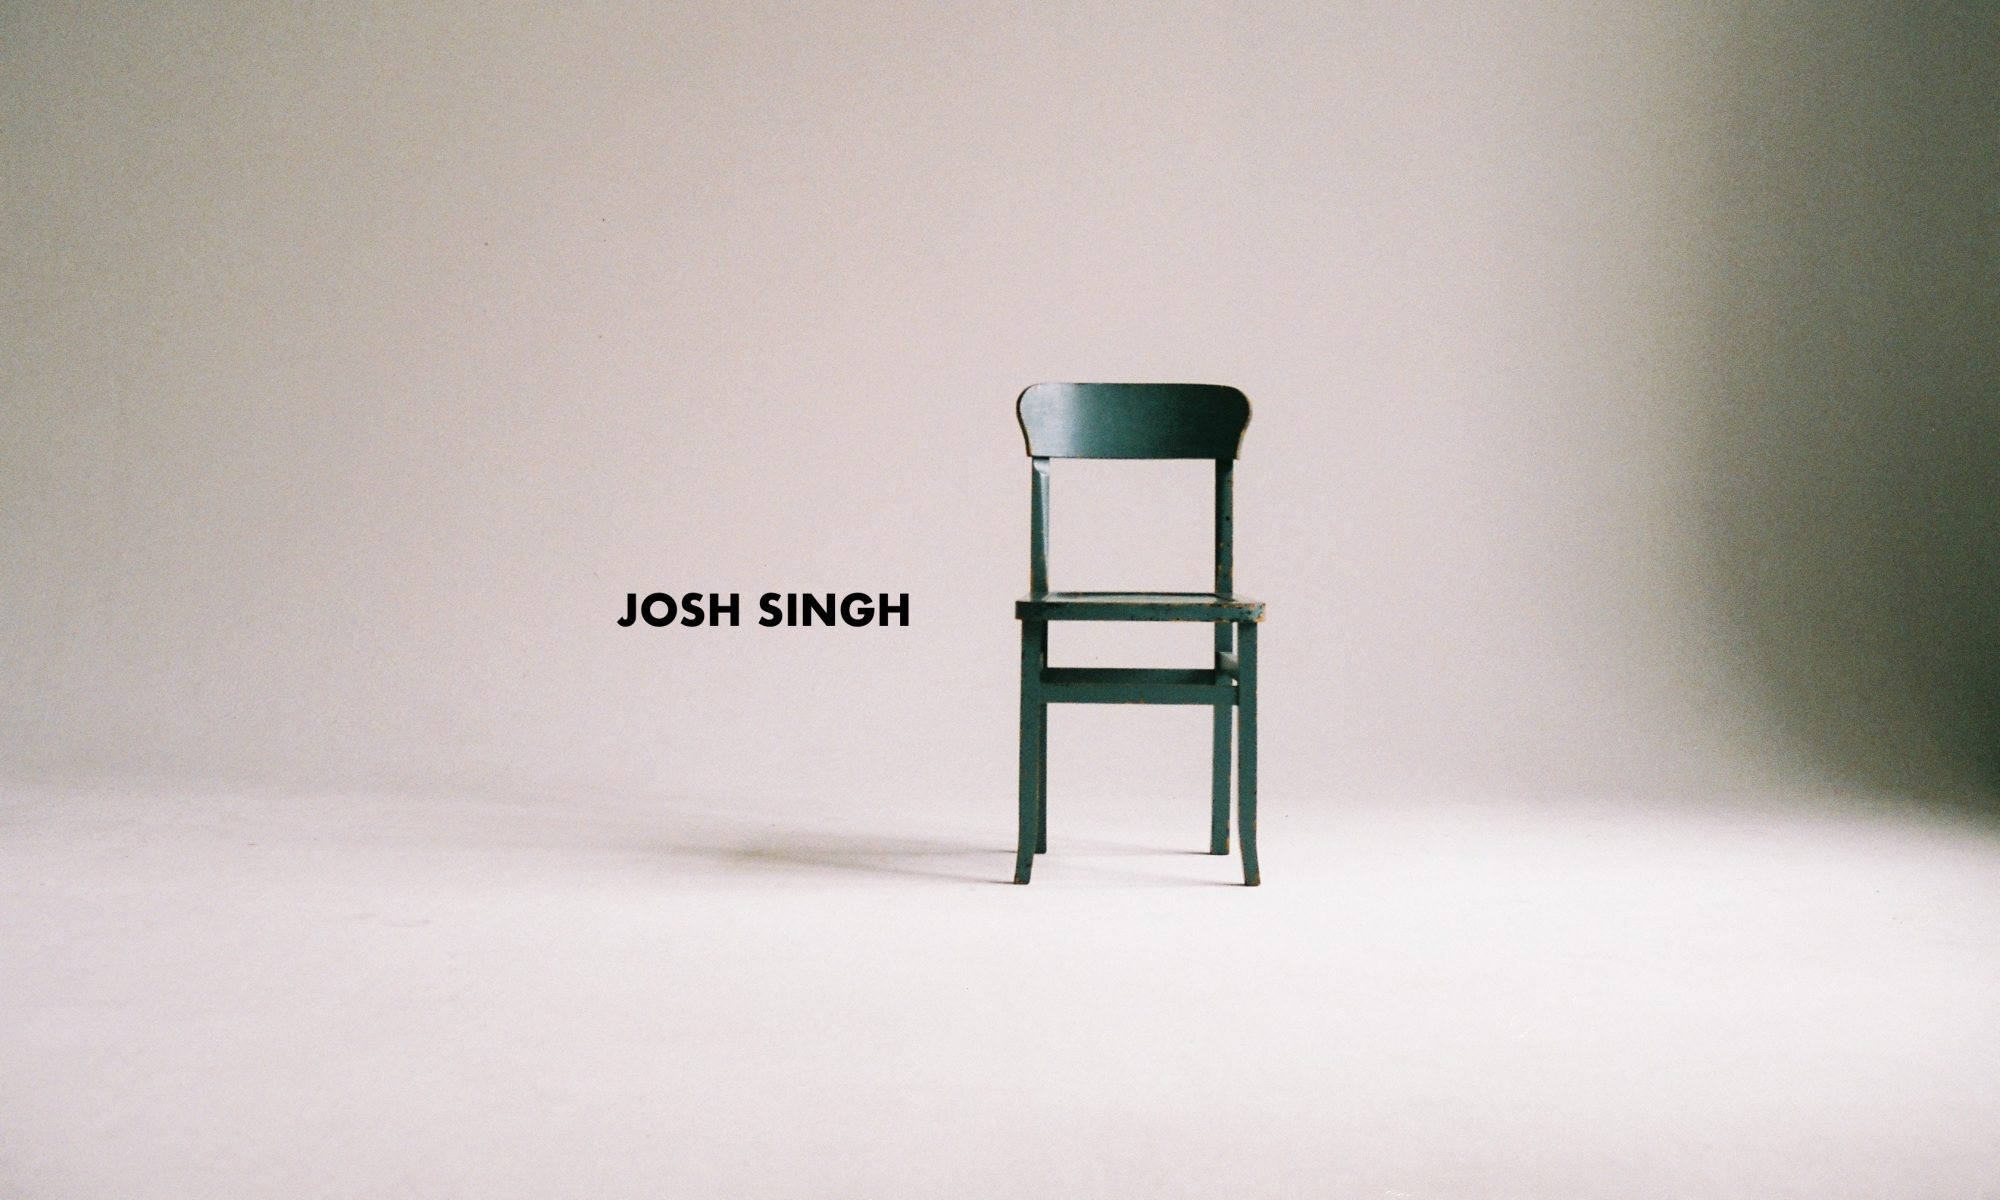 josh singh